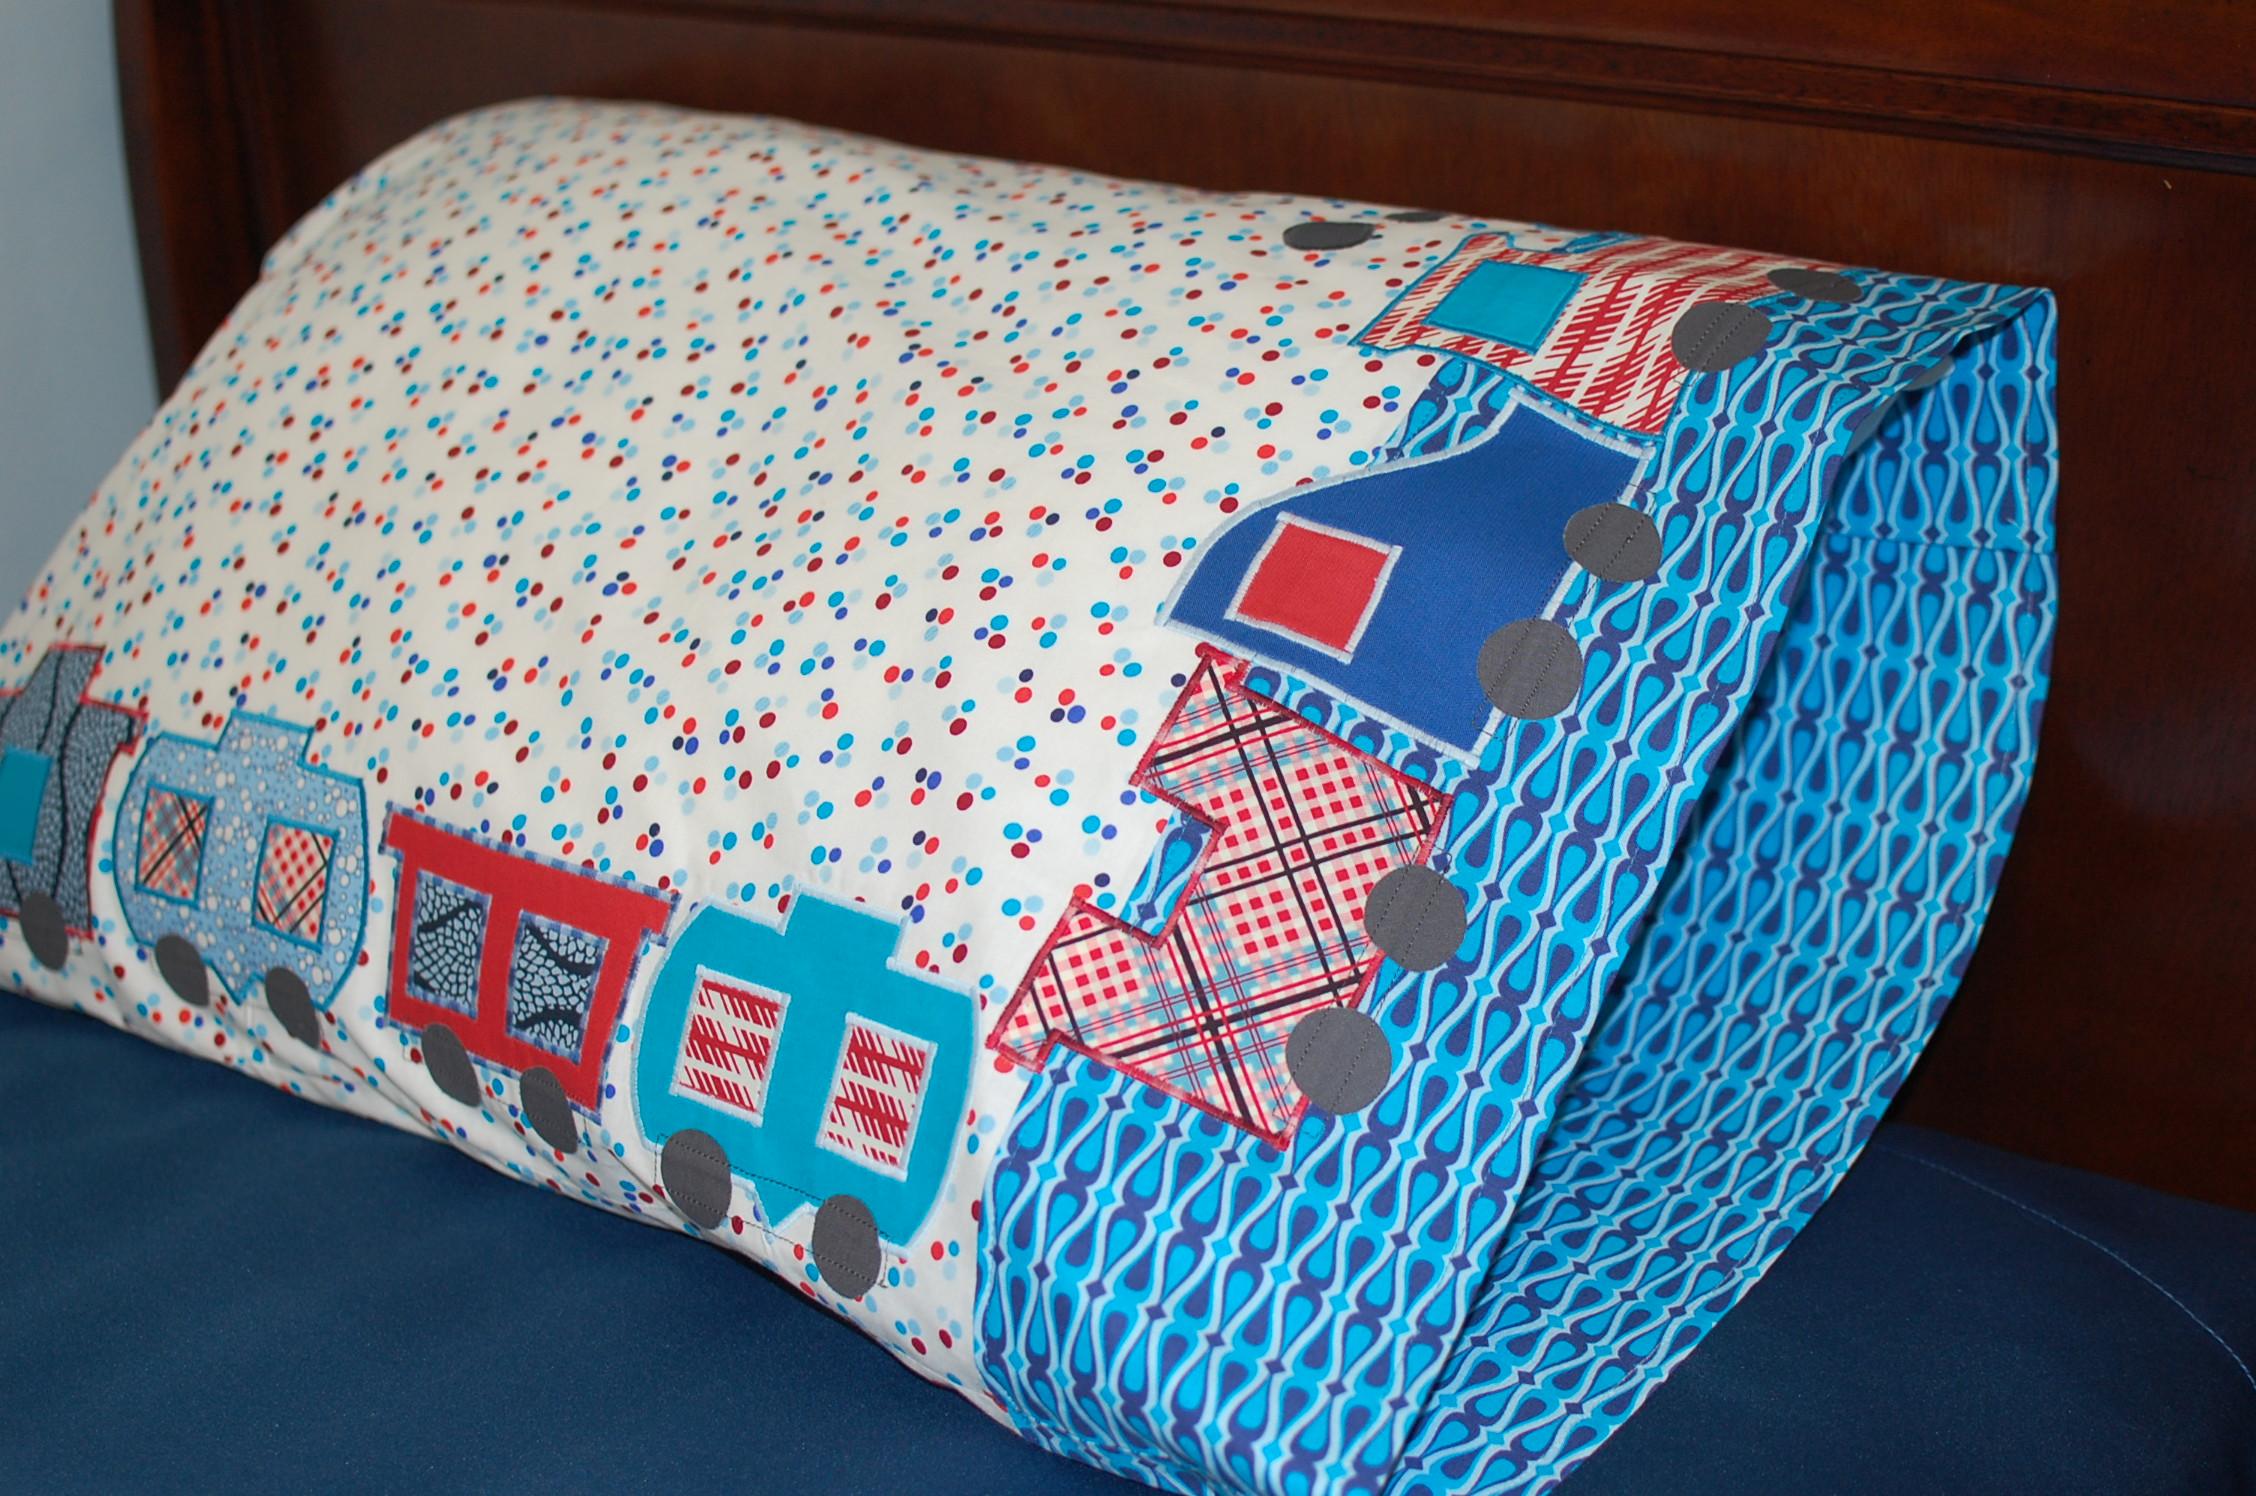 Coats & Clark's and FreeSpirit's Pillowcase